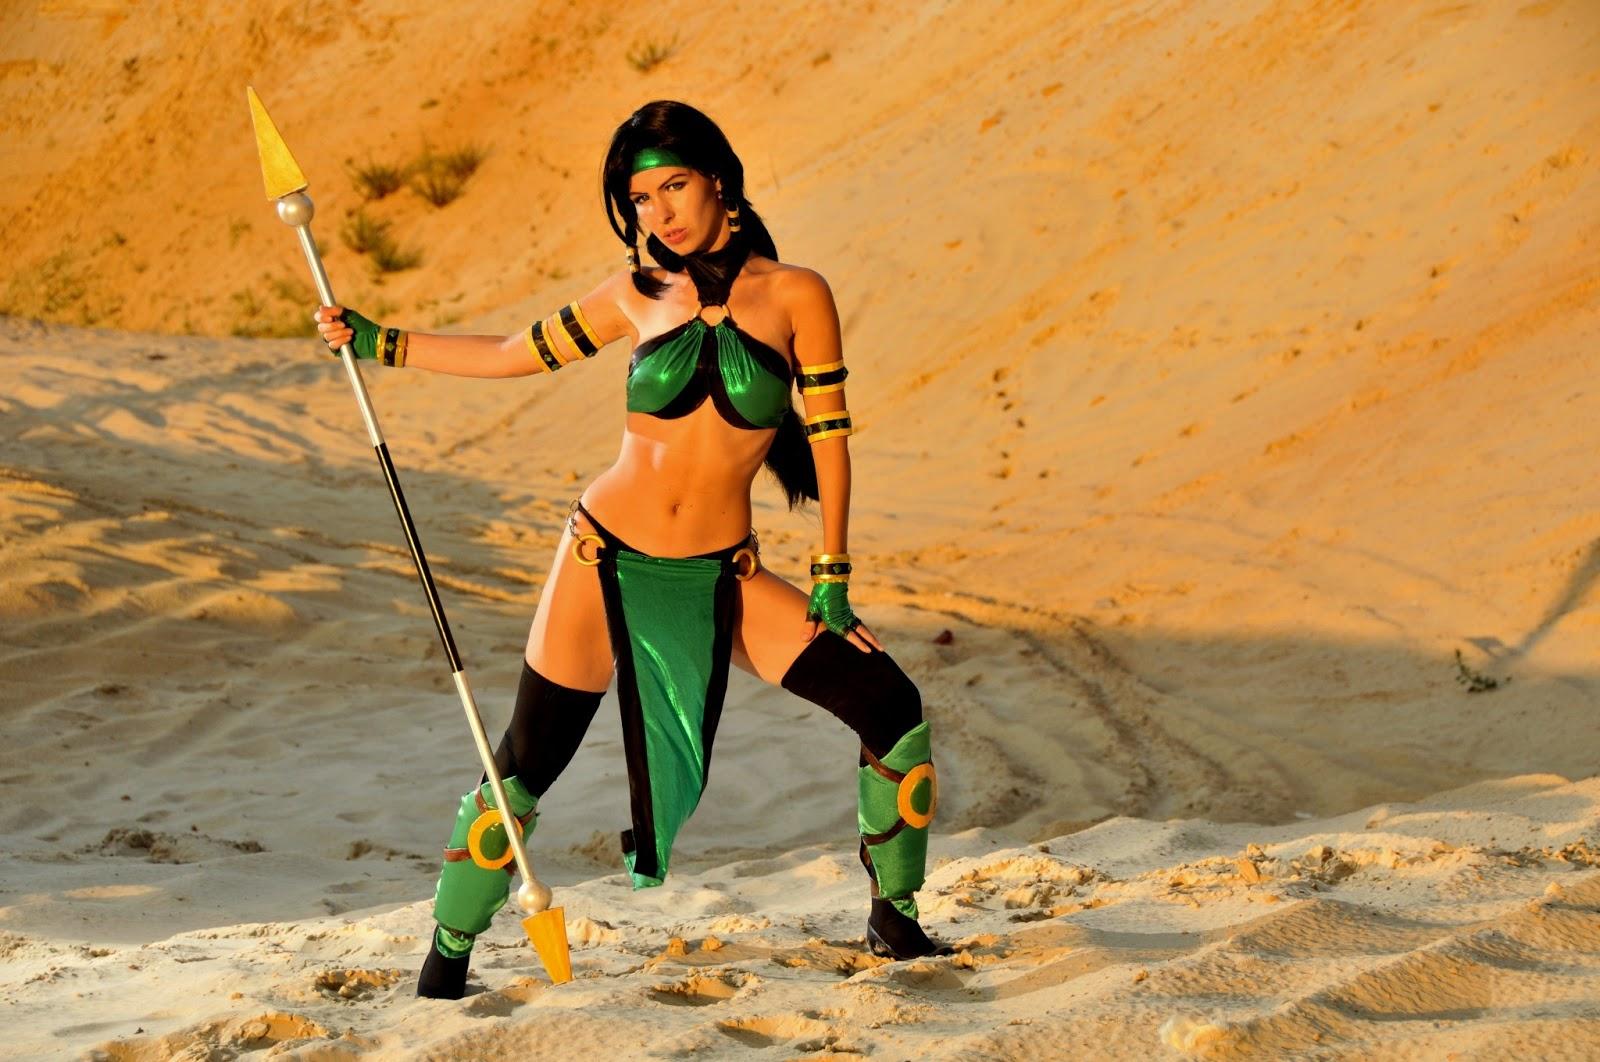 Mortal kombat 9 jade naiked erotica wild girl